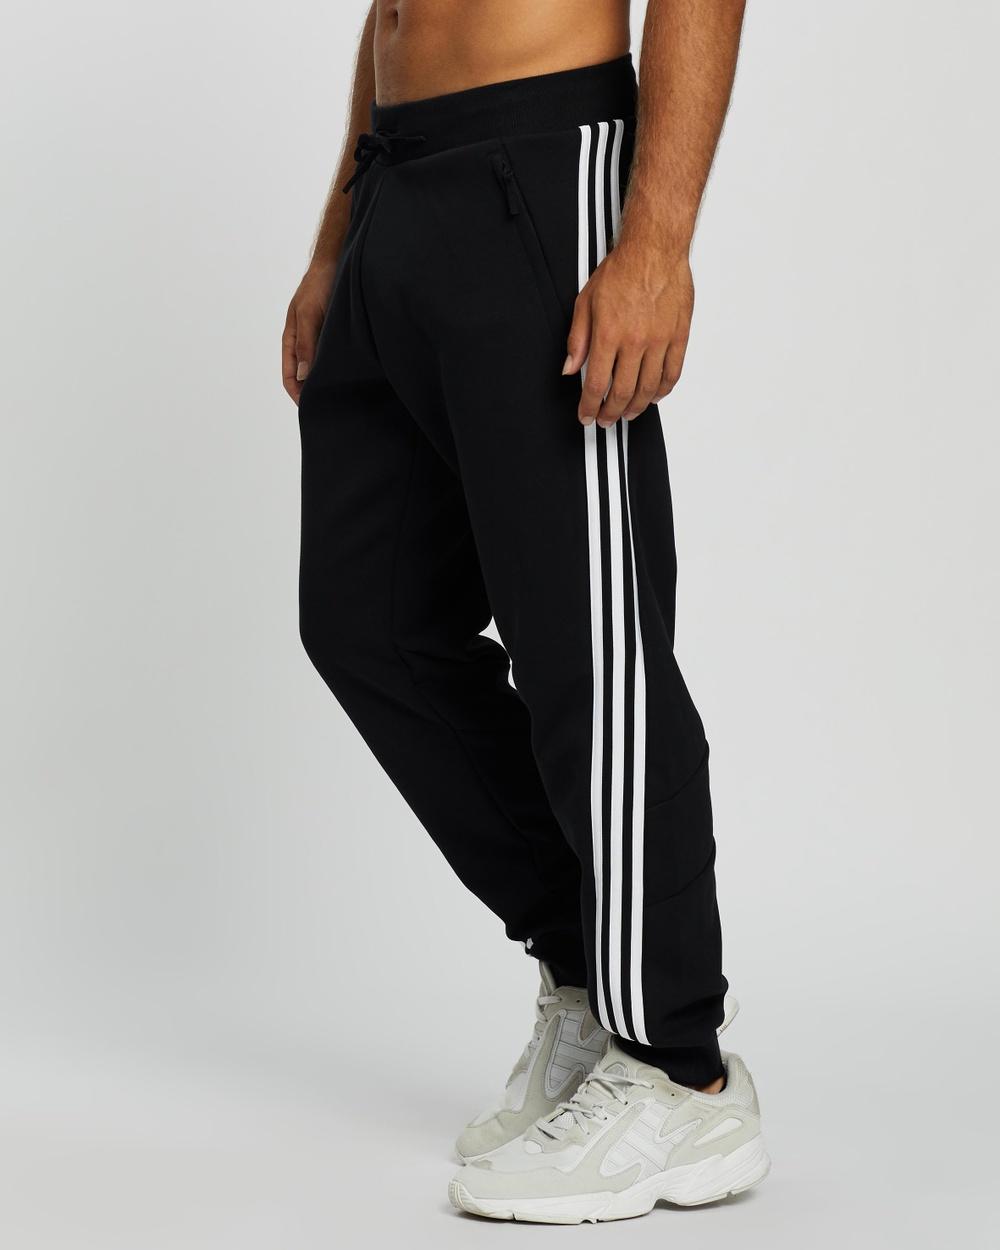 adidas Performance 3 Stripes Sweat Pants Track Black 3-Stripes